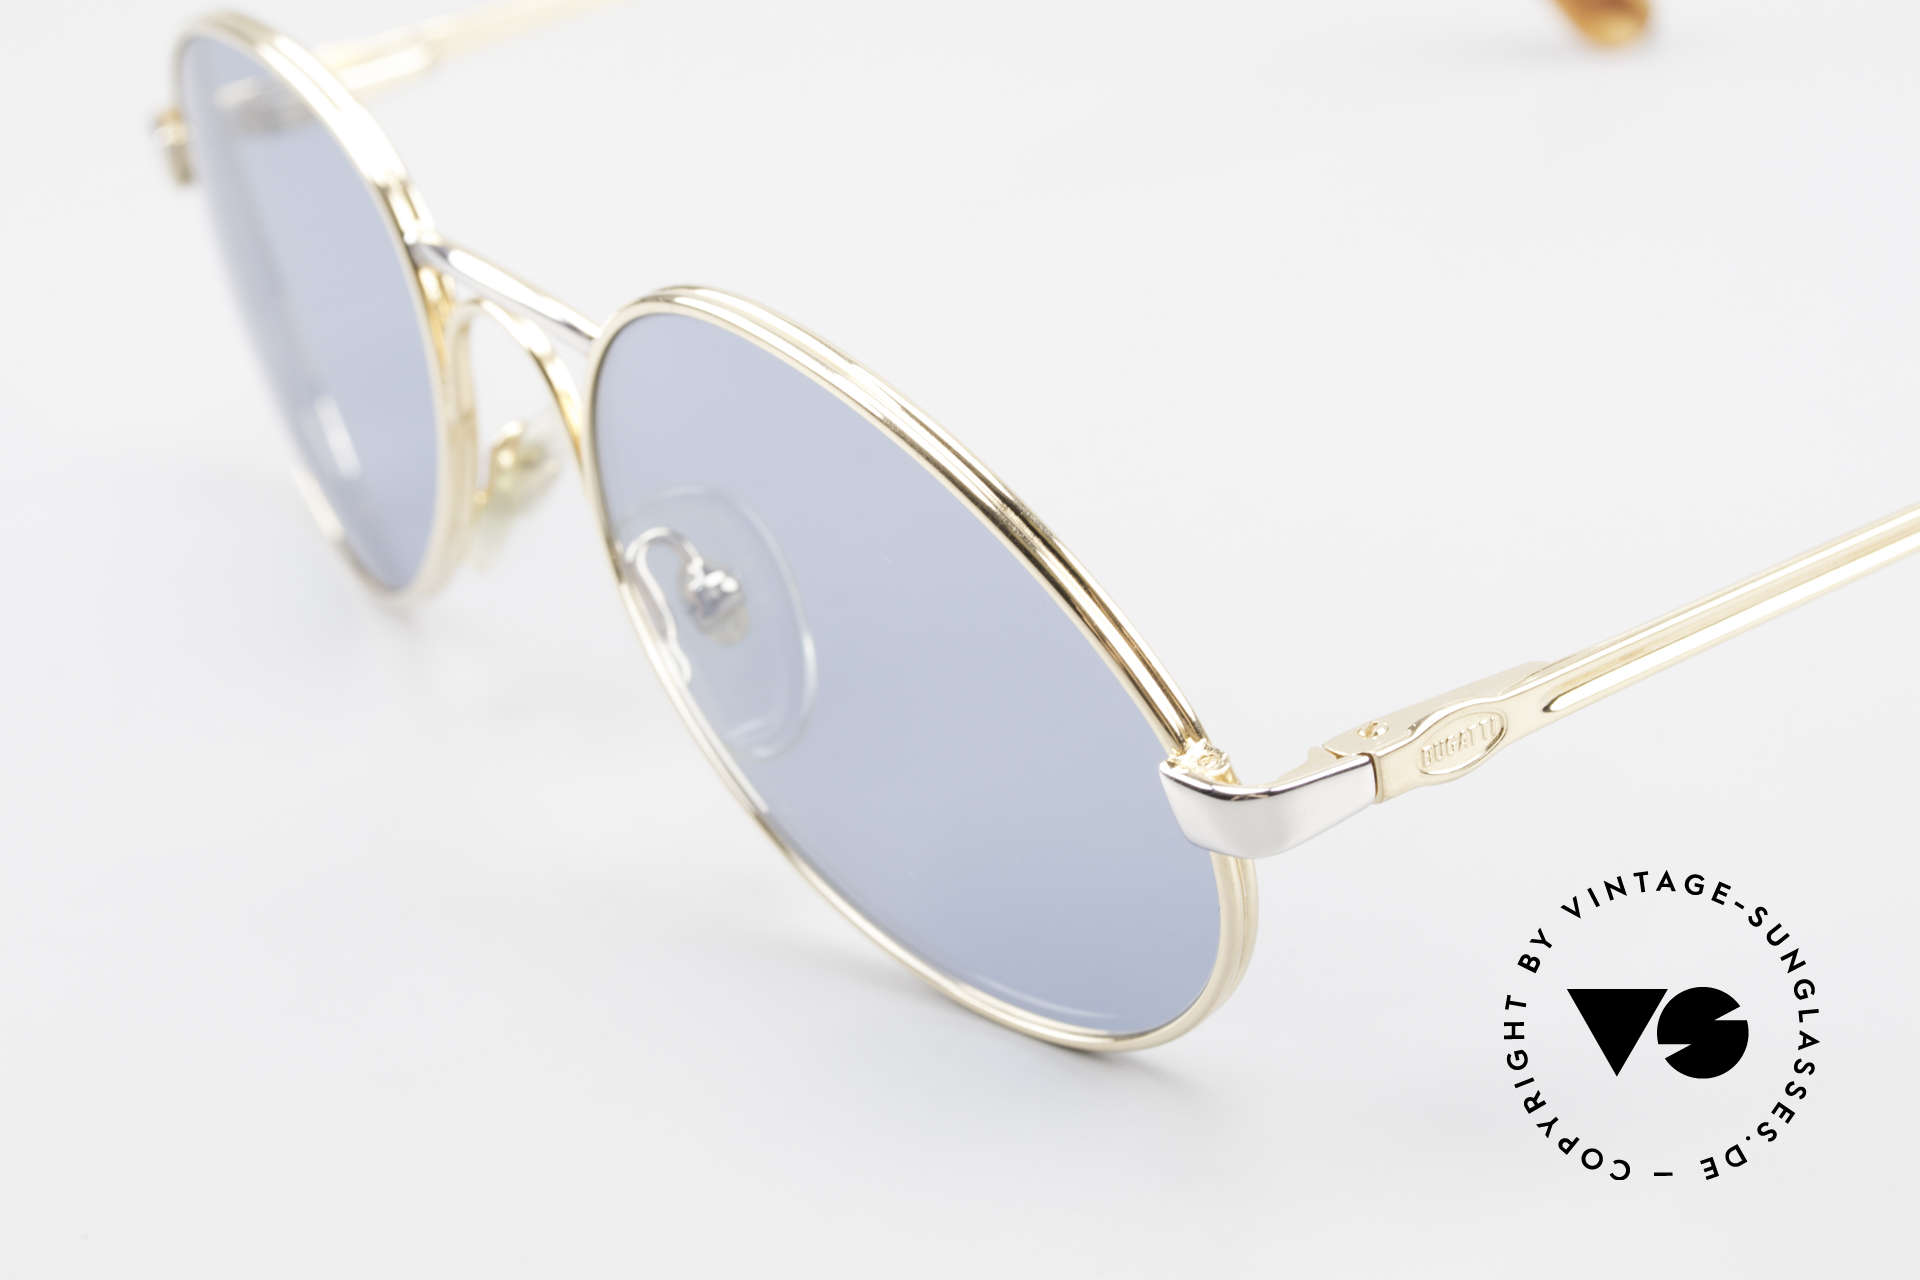 Bugatti 03308 True Vintage 80's Sunglasses, bicolor (gold/silver) with solid blue lenses (100% UV), Made for Men